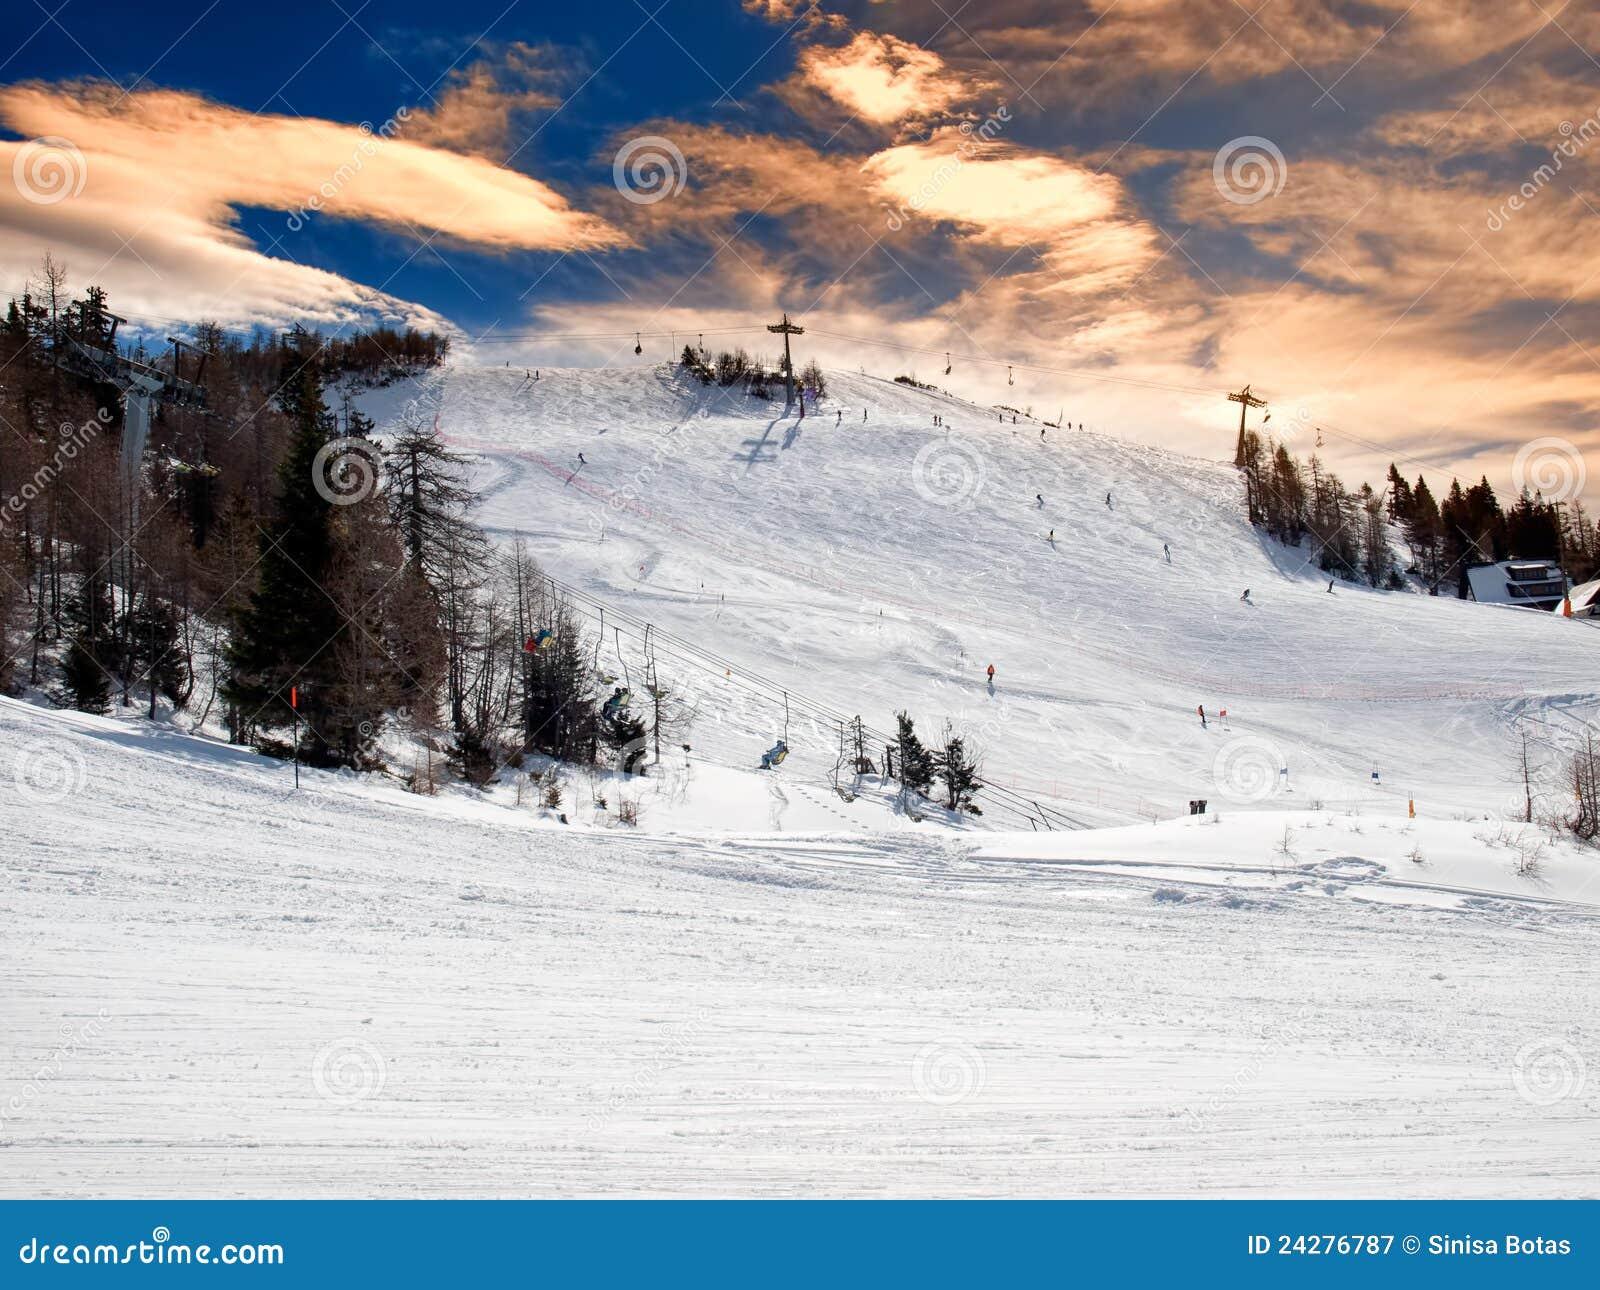 Ski resort royalty free stock photography image 24276787 for Moderne skihotels